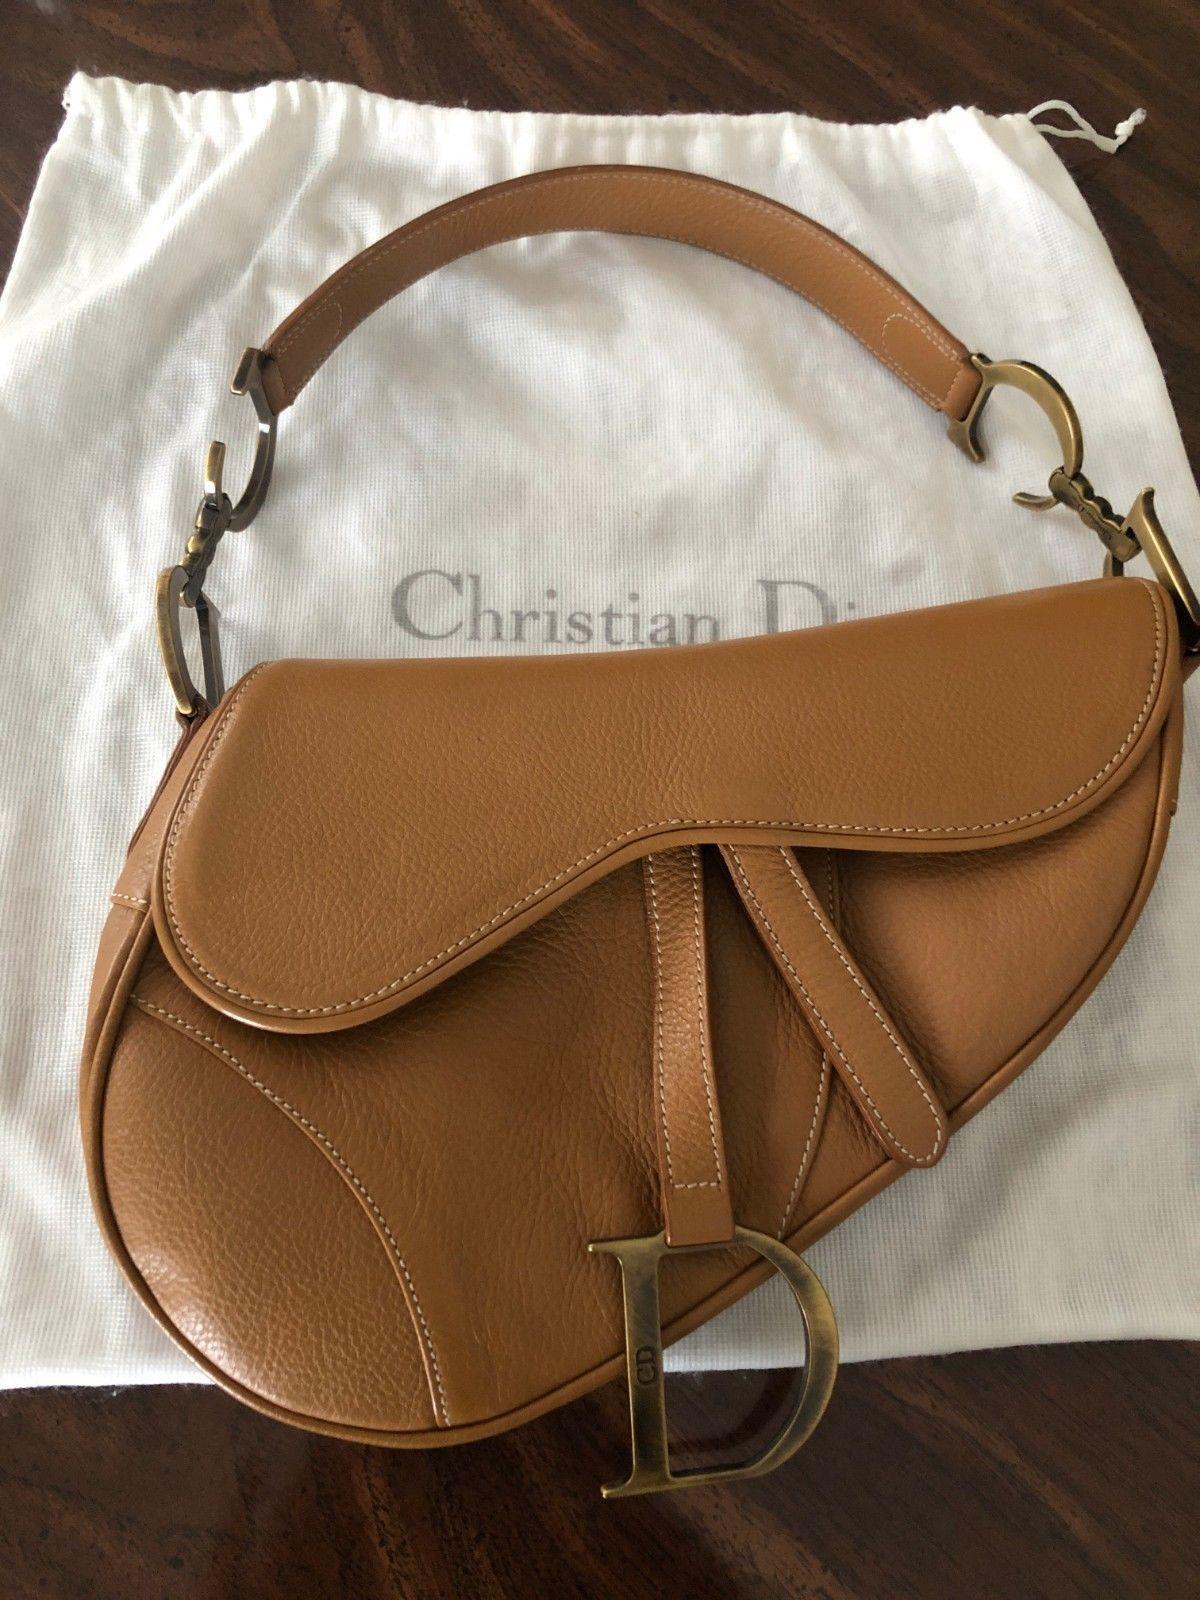 4e455be6afbc9 Christian Dior Saddle Bag in Beige Leather